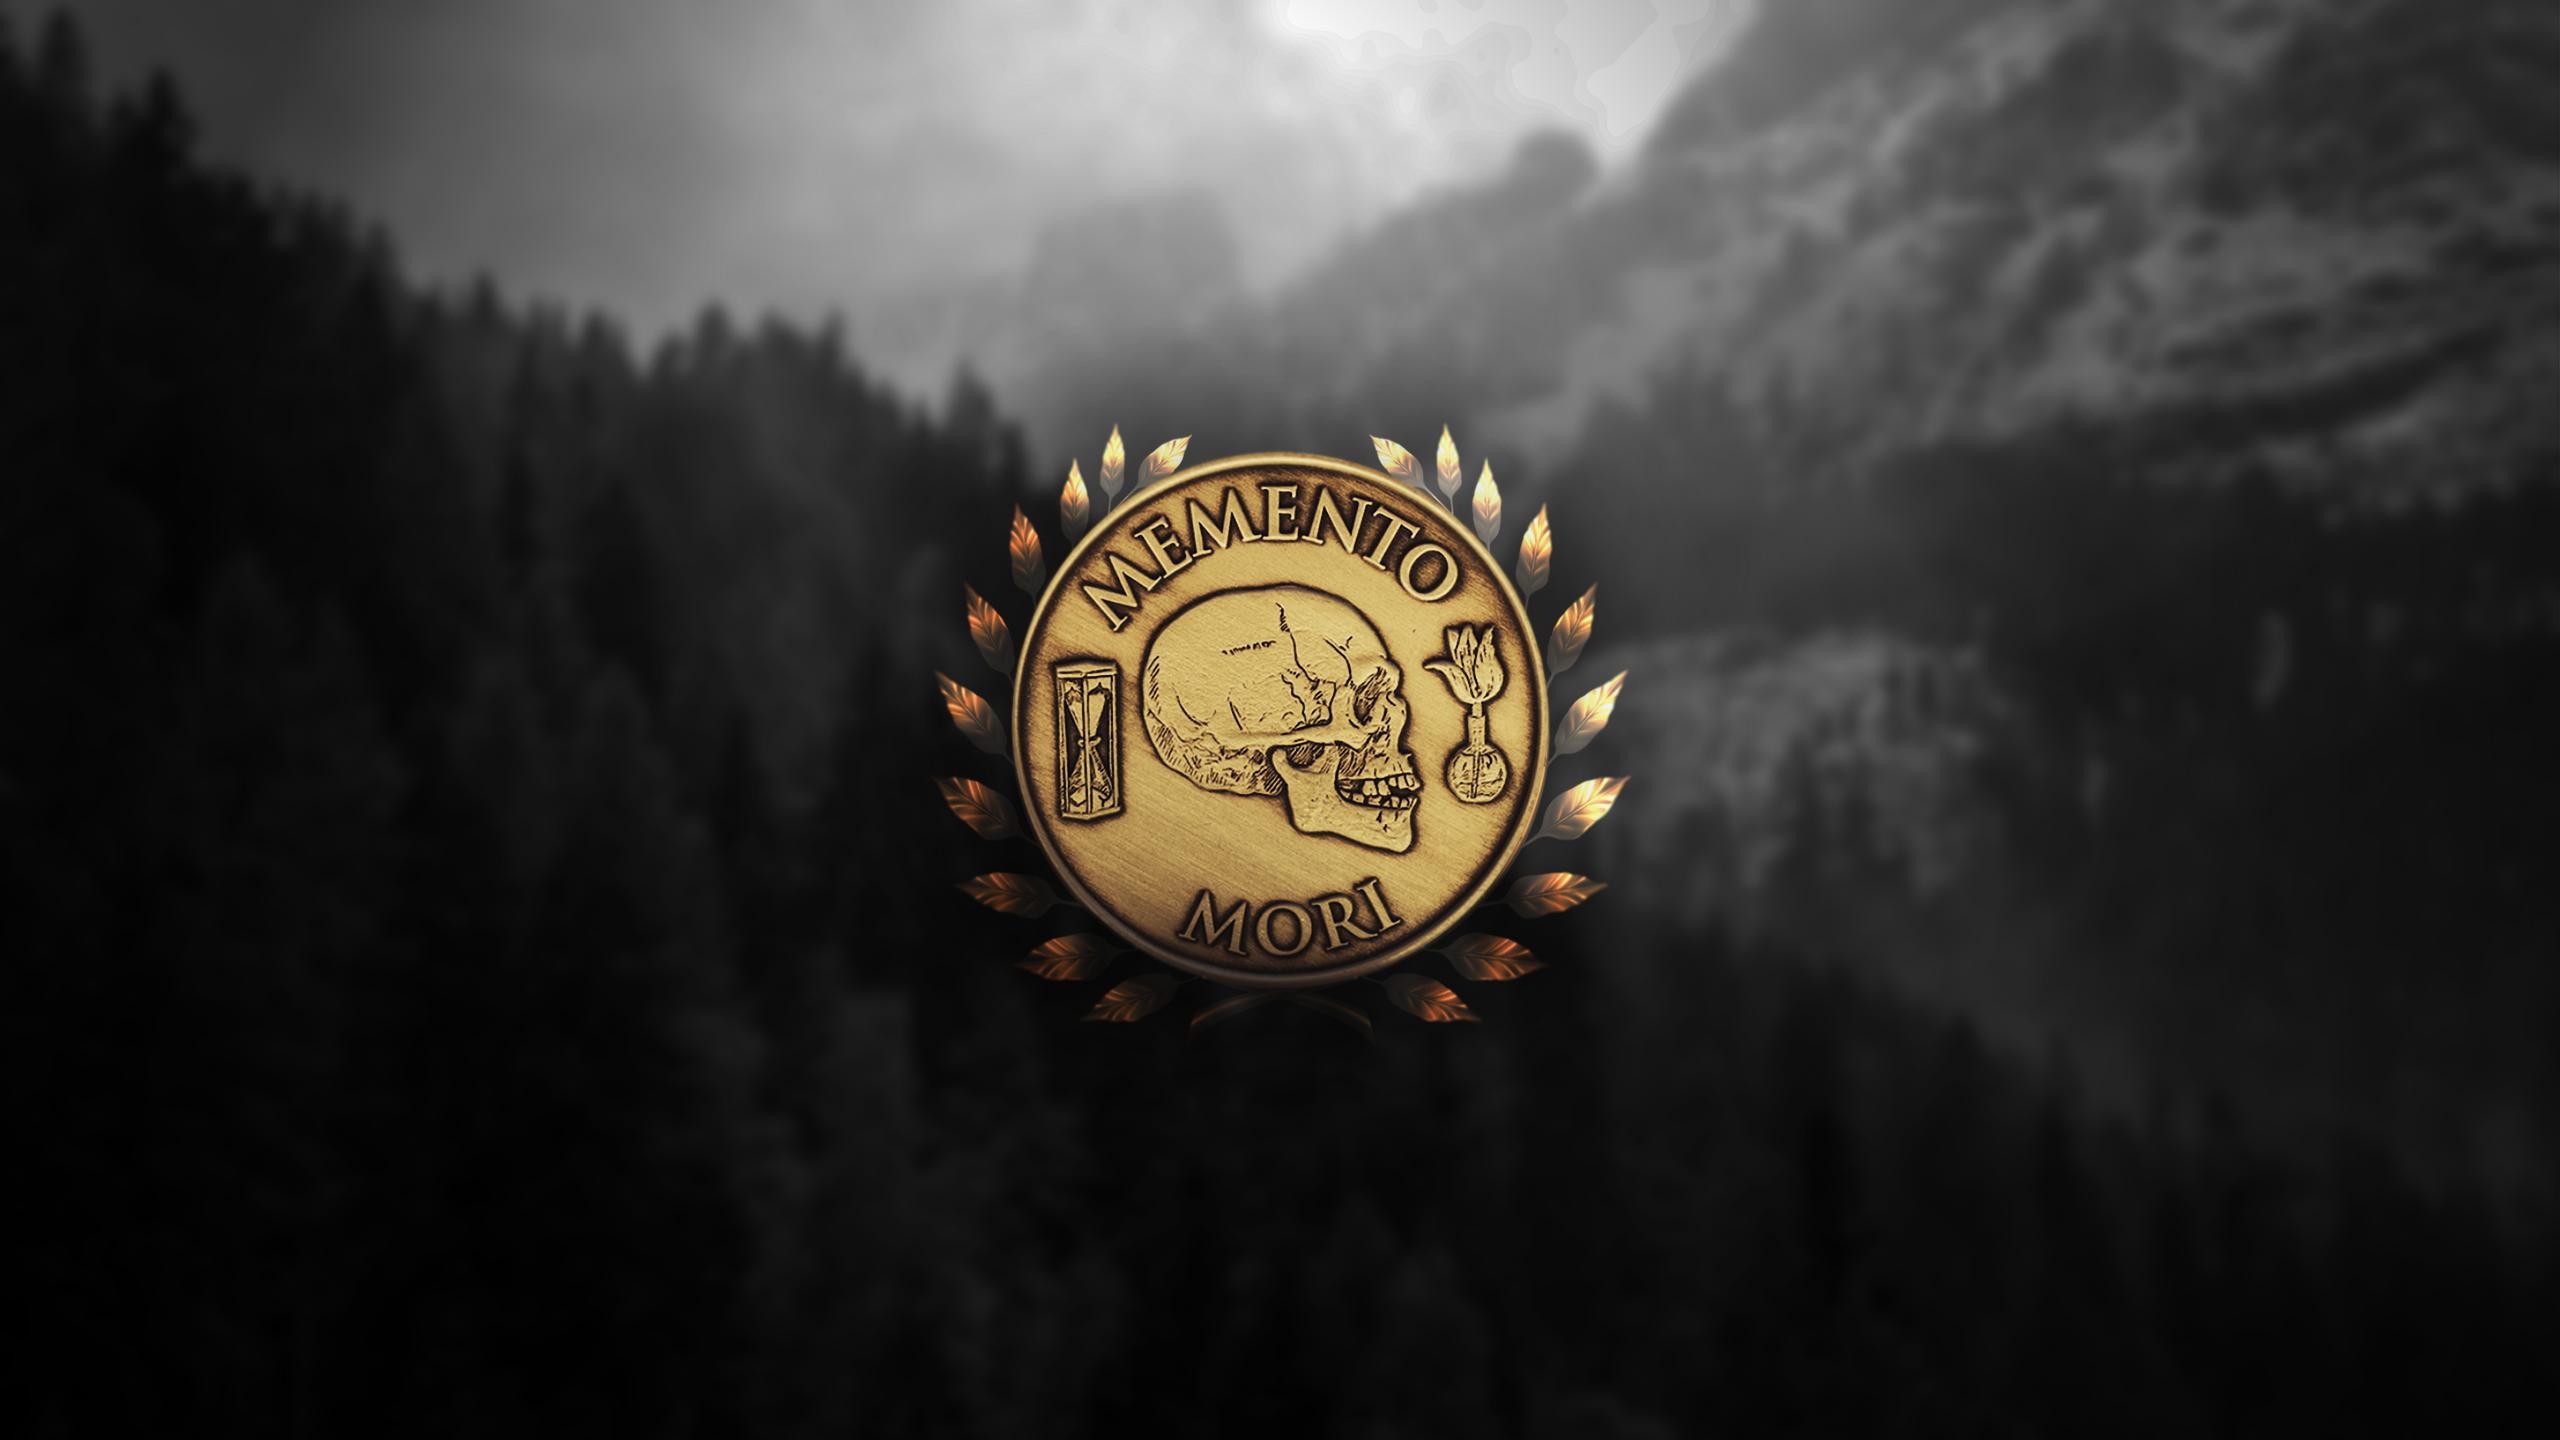 General 2560x1440 Memento Mori coin gold monochrome forest logo